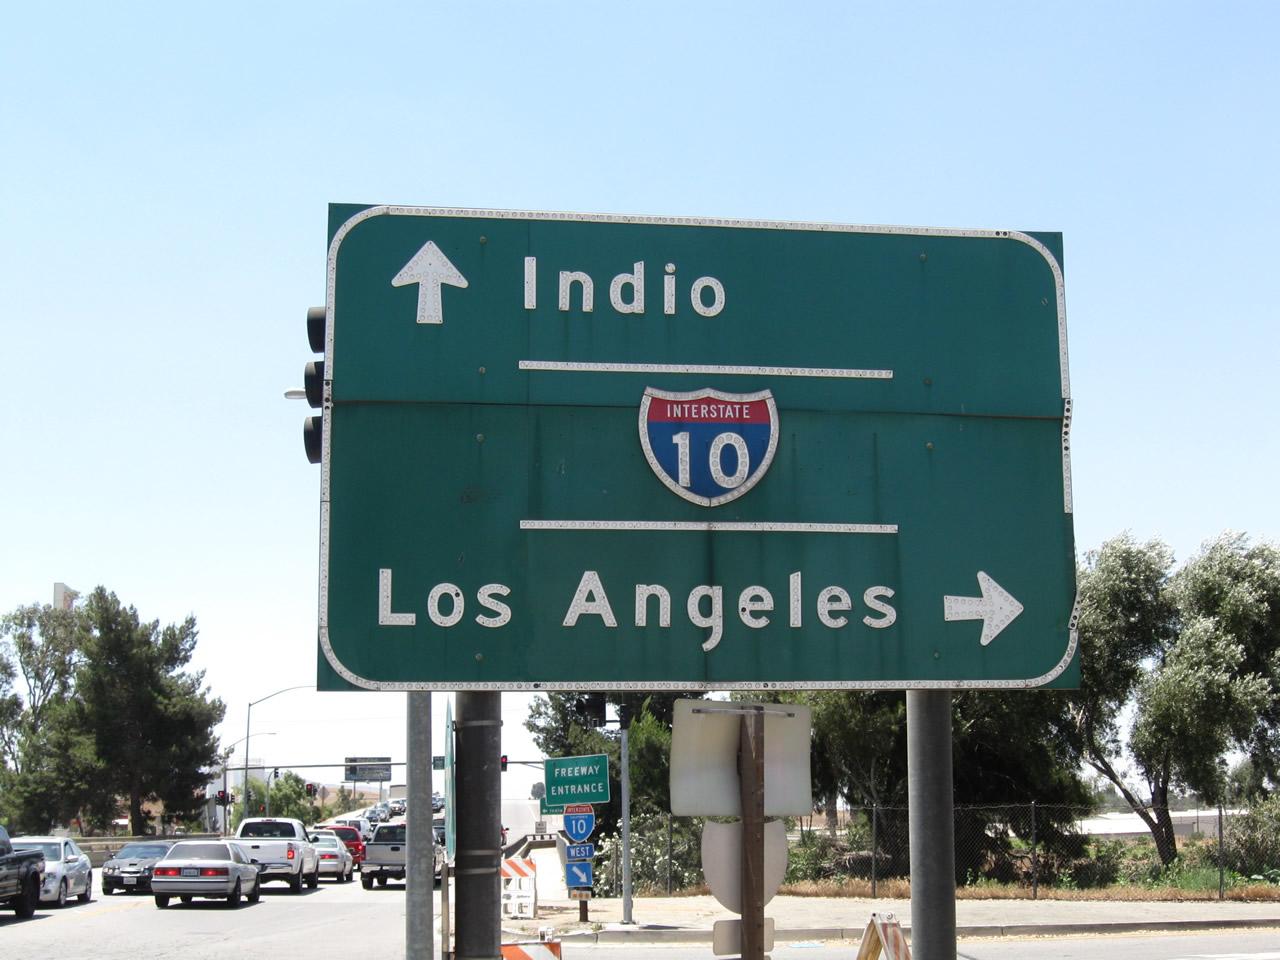 California @ AARoads - California 79 South - Riverside County